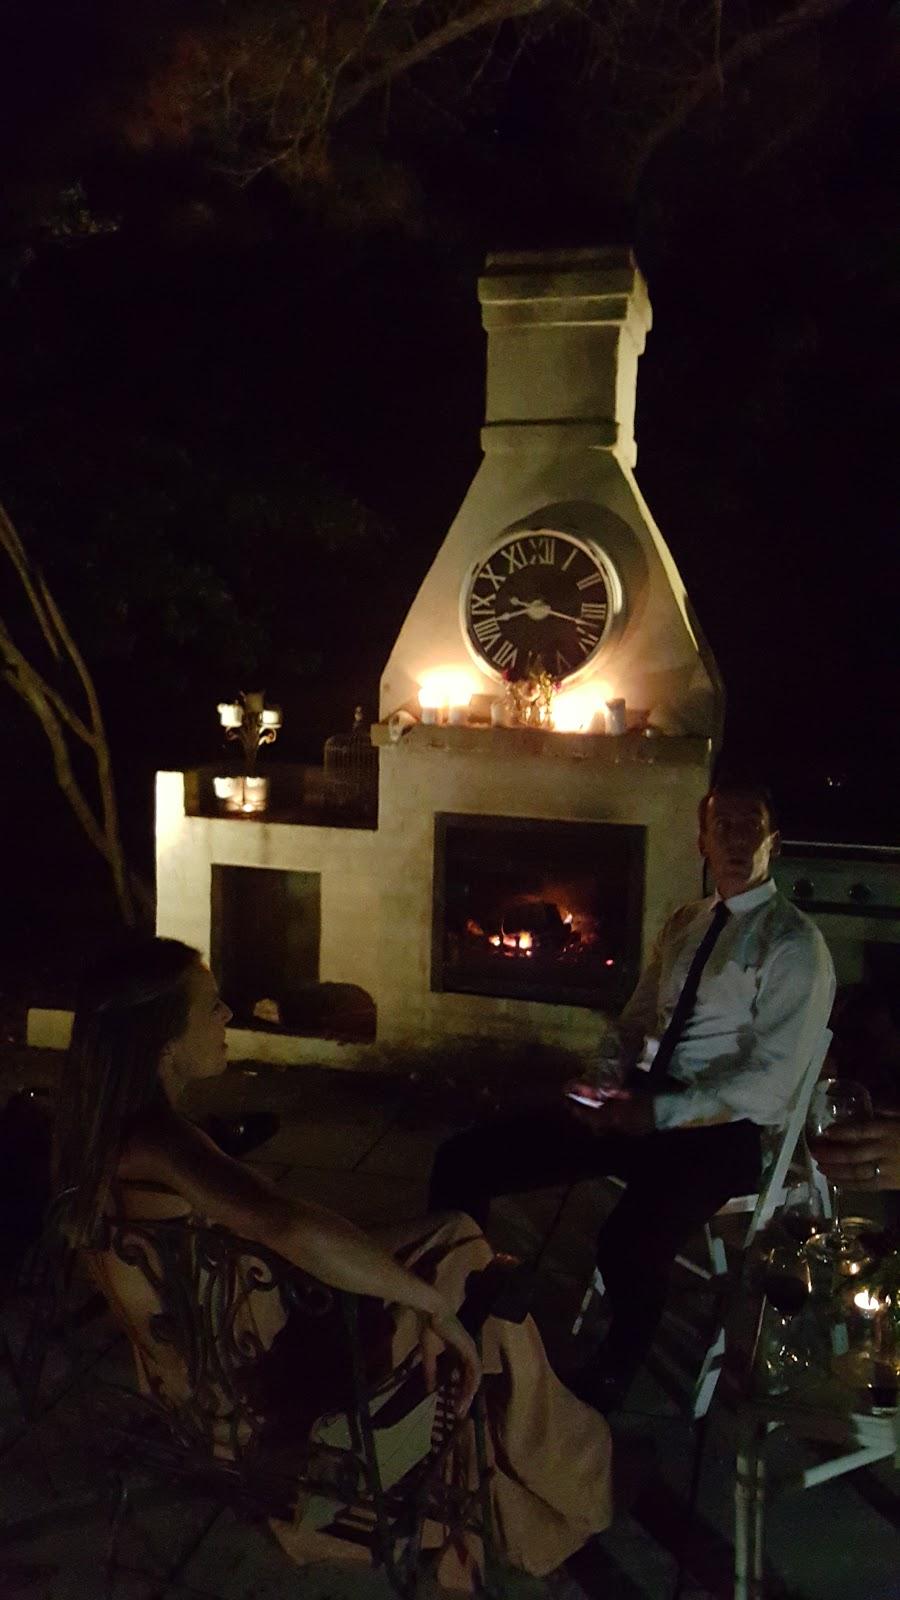 Somerley House   park   7207 Illawarra Hwy, Sutton Forest NSW 2577, Australia   0403047084 OR +61 403 047 084